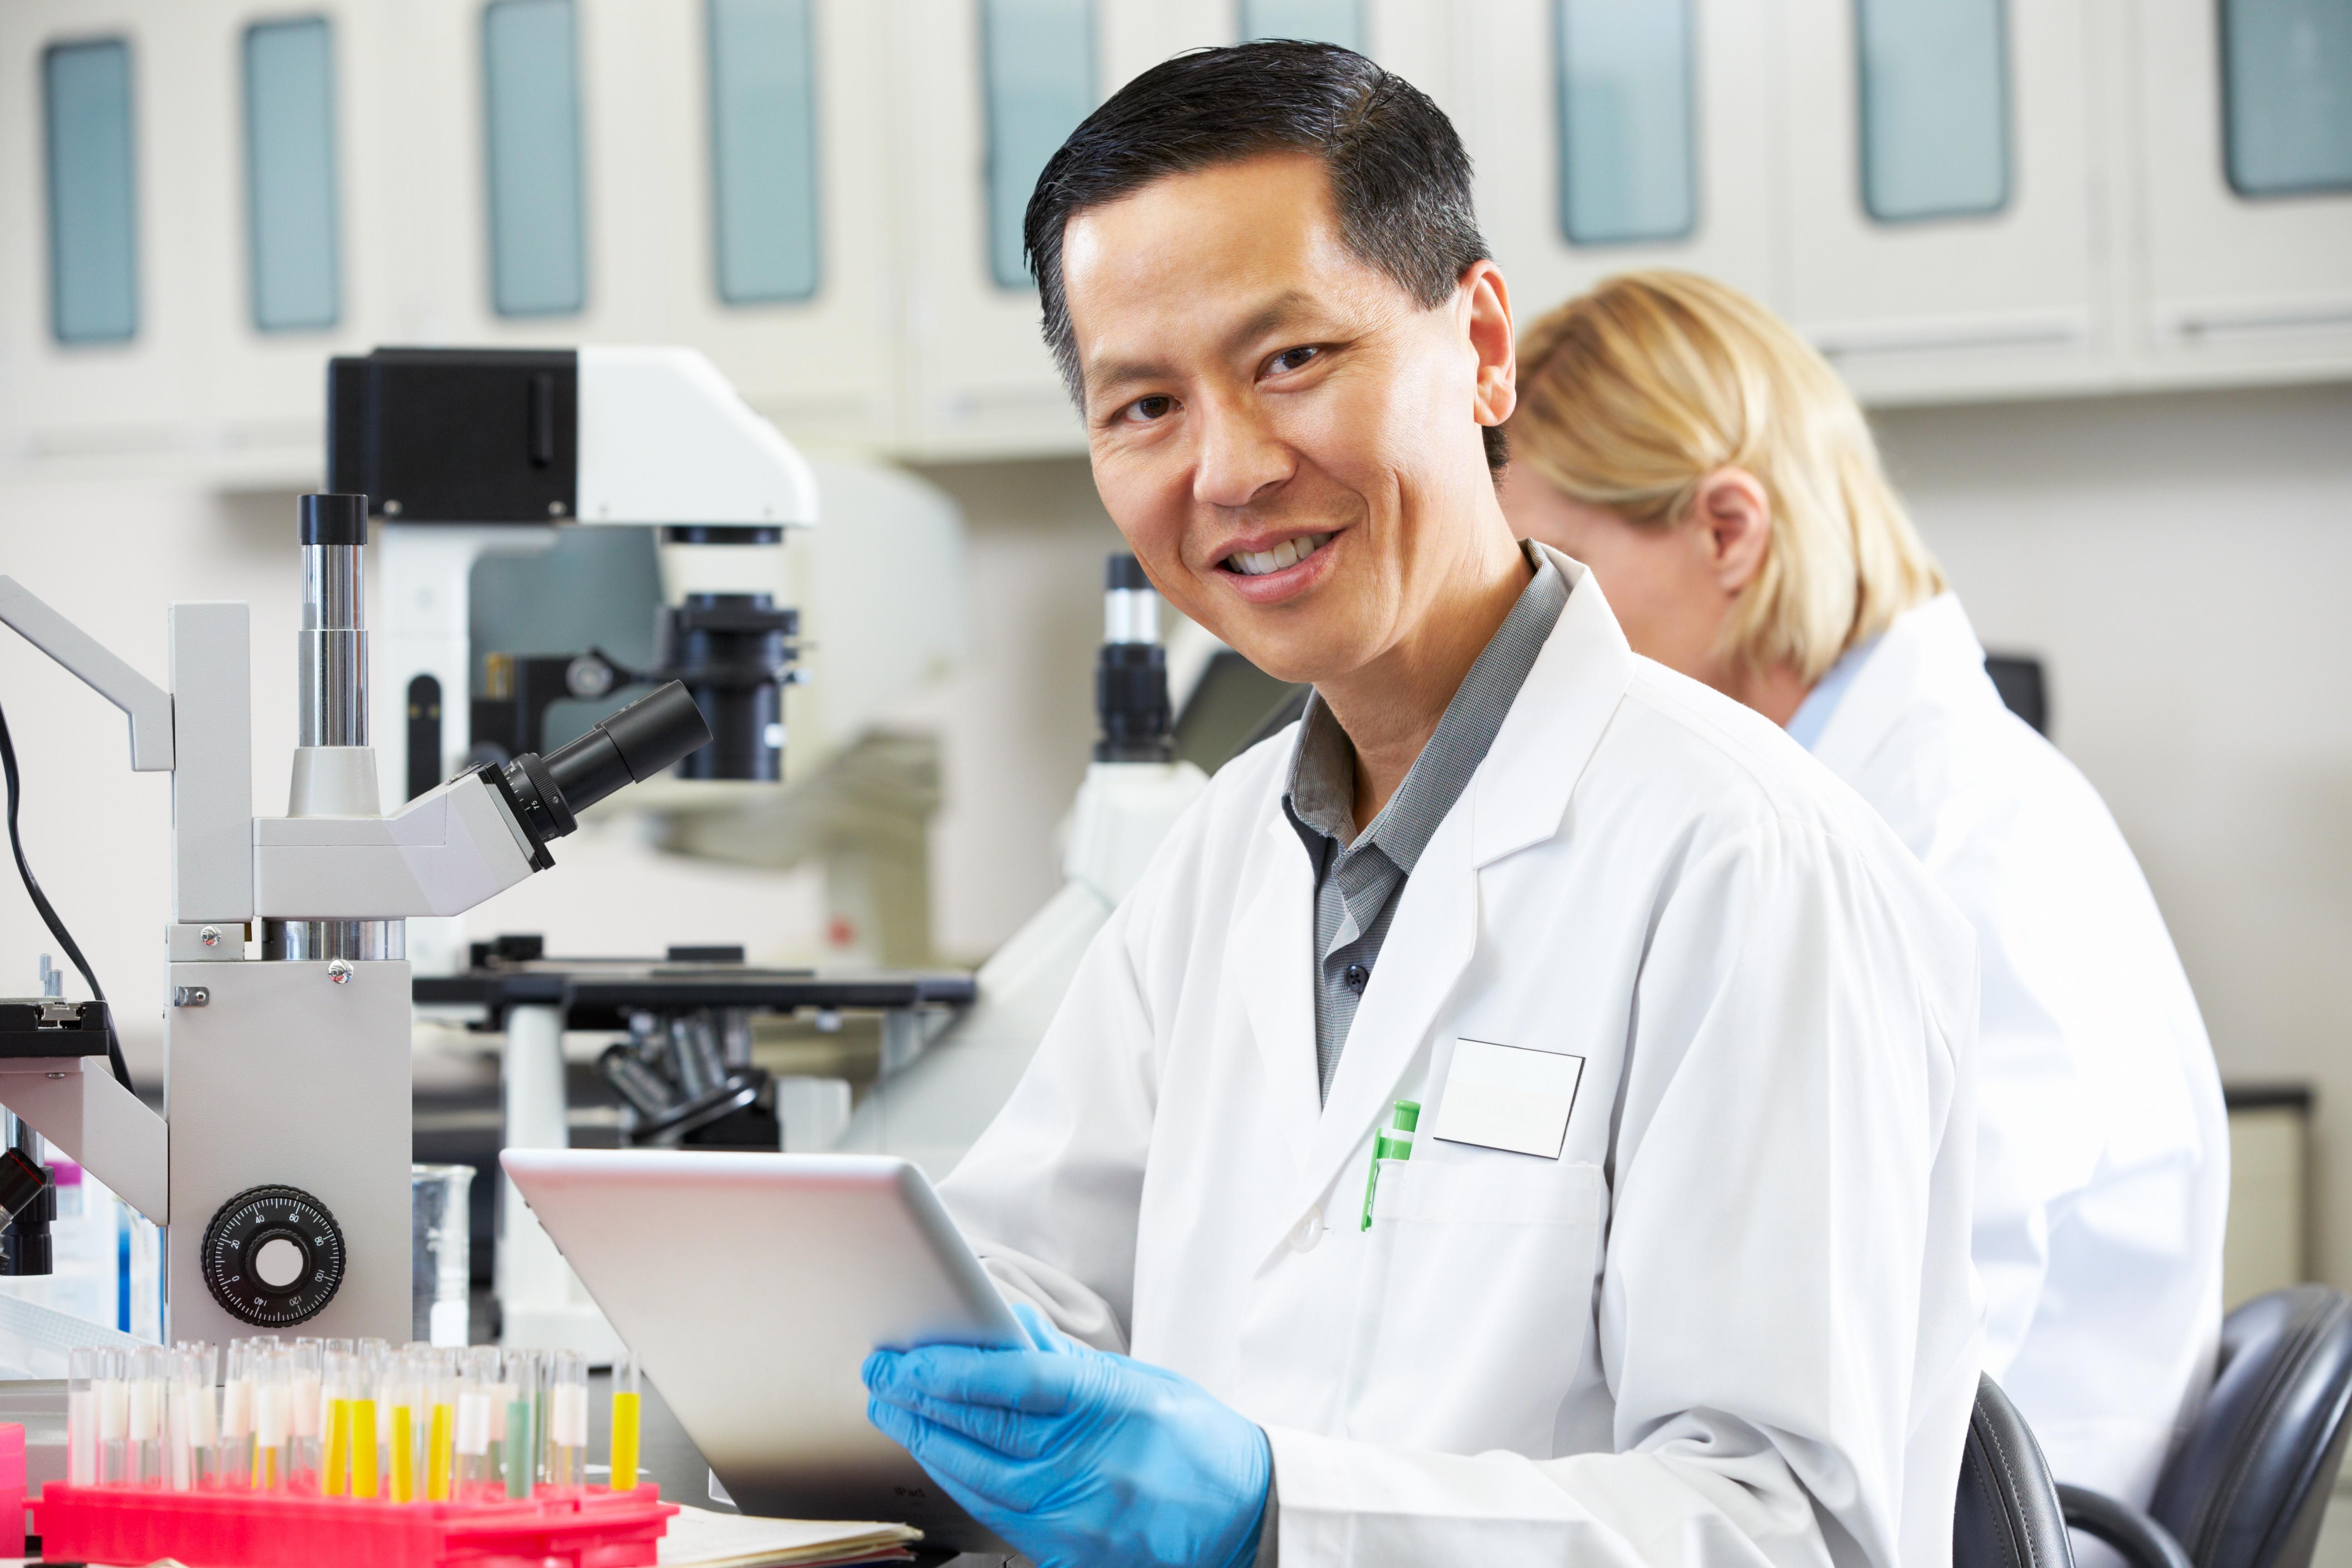 Clinical-diagnostics-development-clinical-trial-testing-central-laboratory-assay-design-validation-verification-development